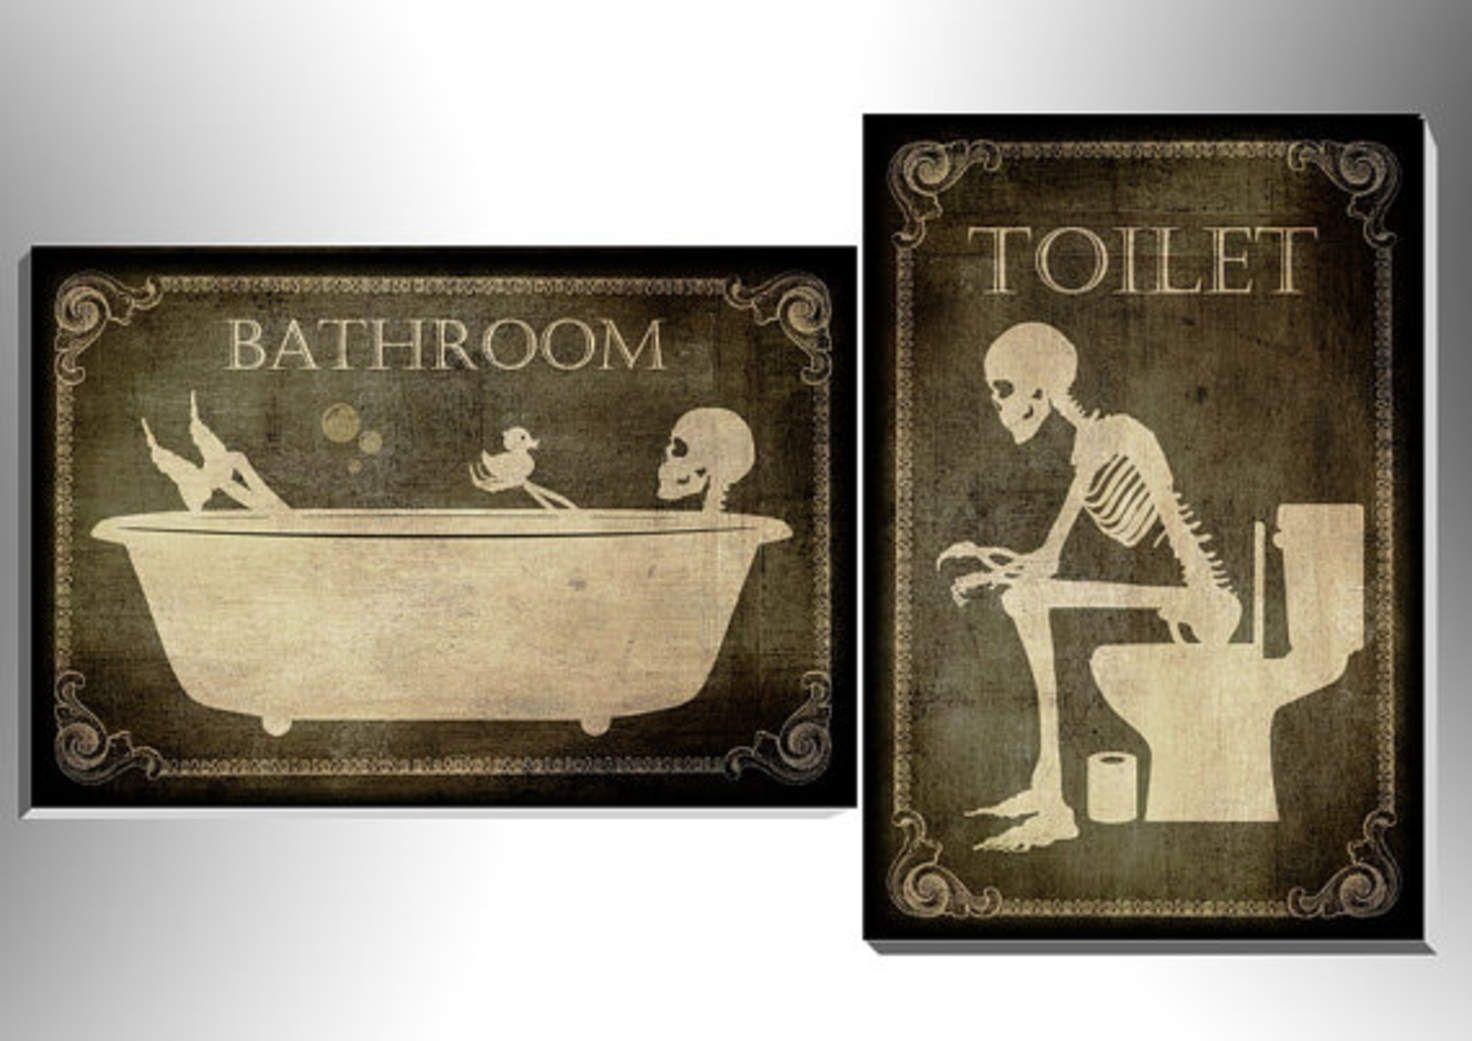 Toilet and bathroom signesartskullskeletongothicgothfunnydoor